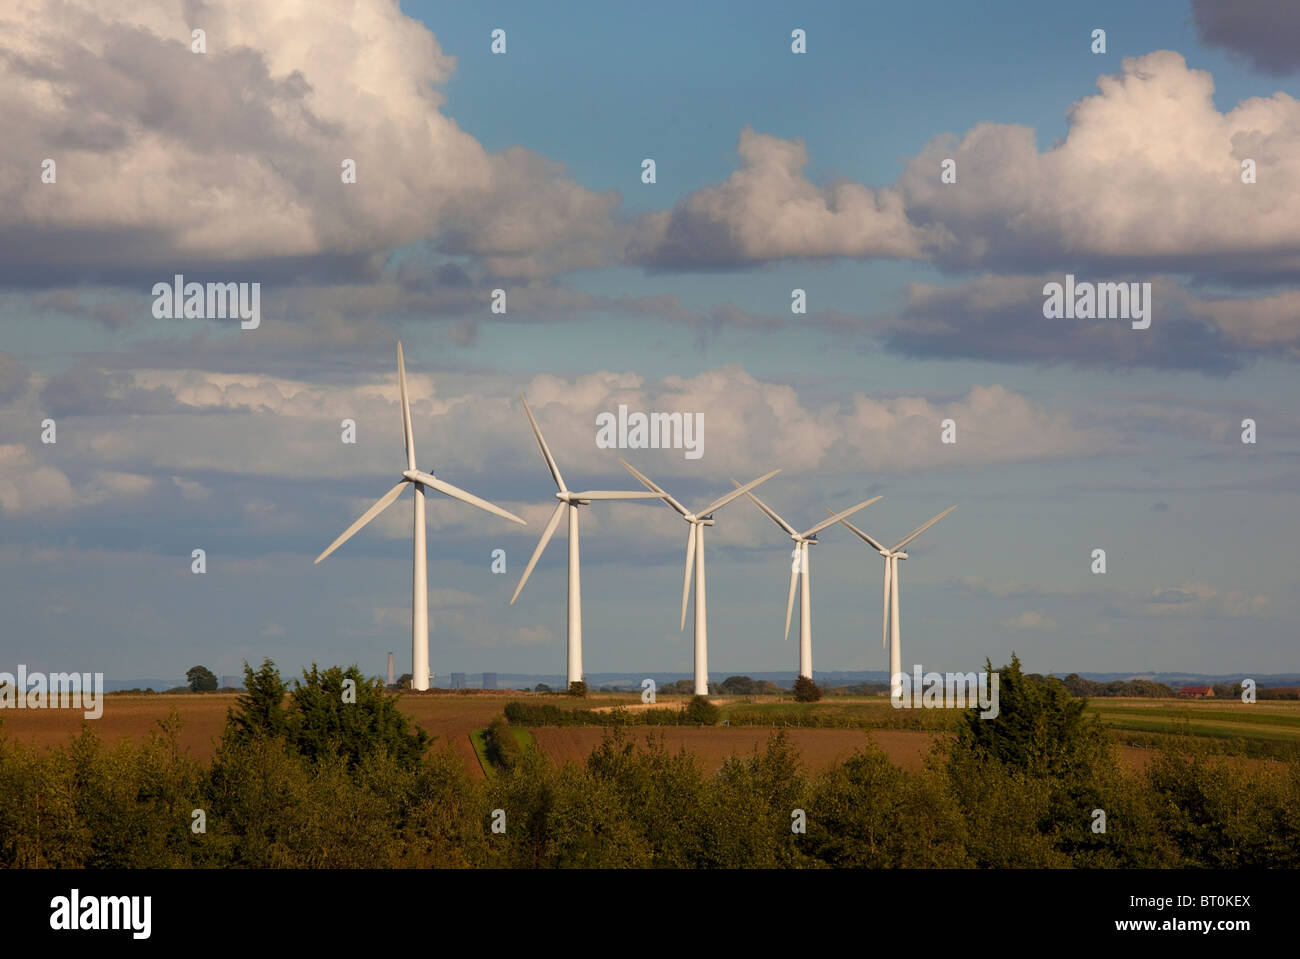 Wind Turbine farm, Watchfield, Oxfordshire, England - Stock Image